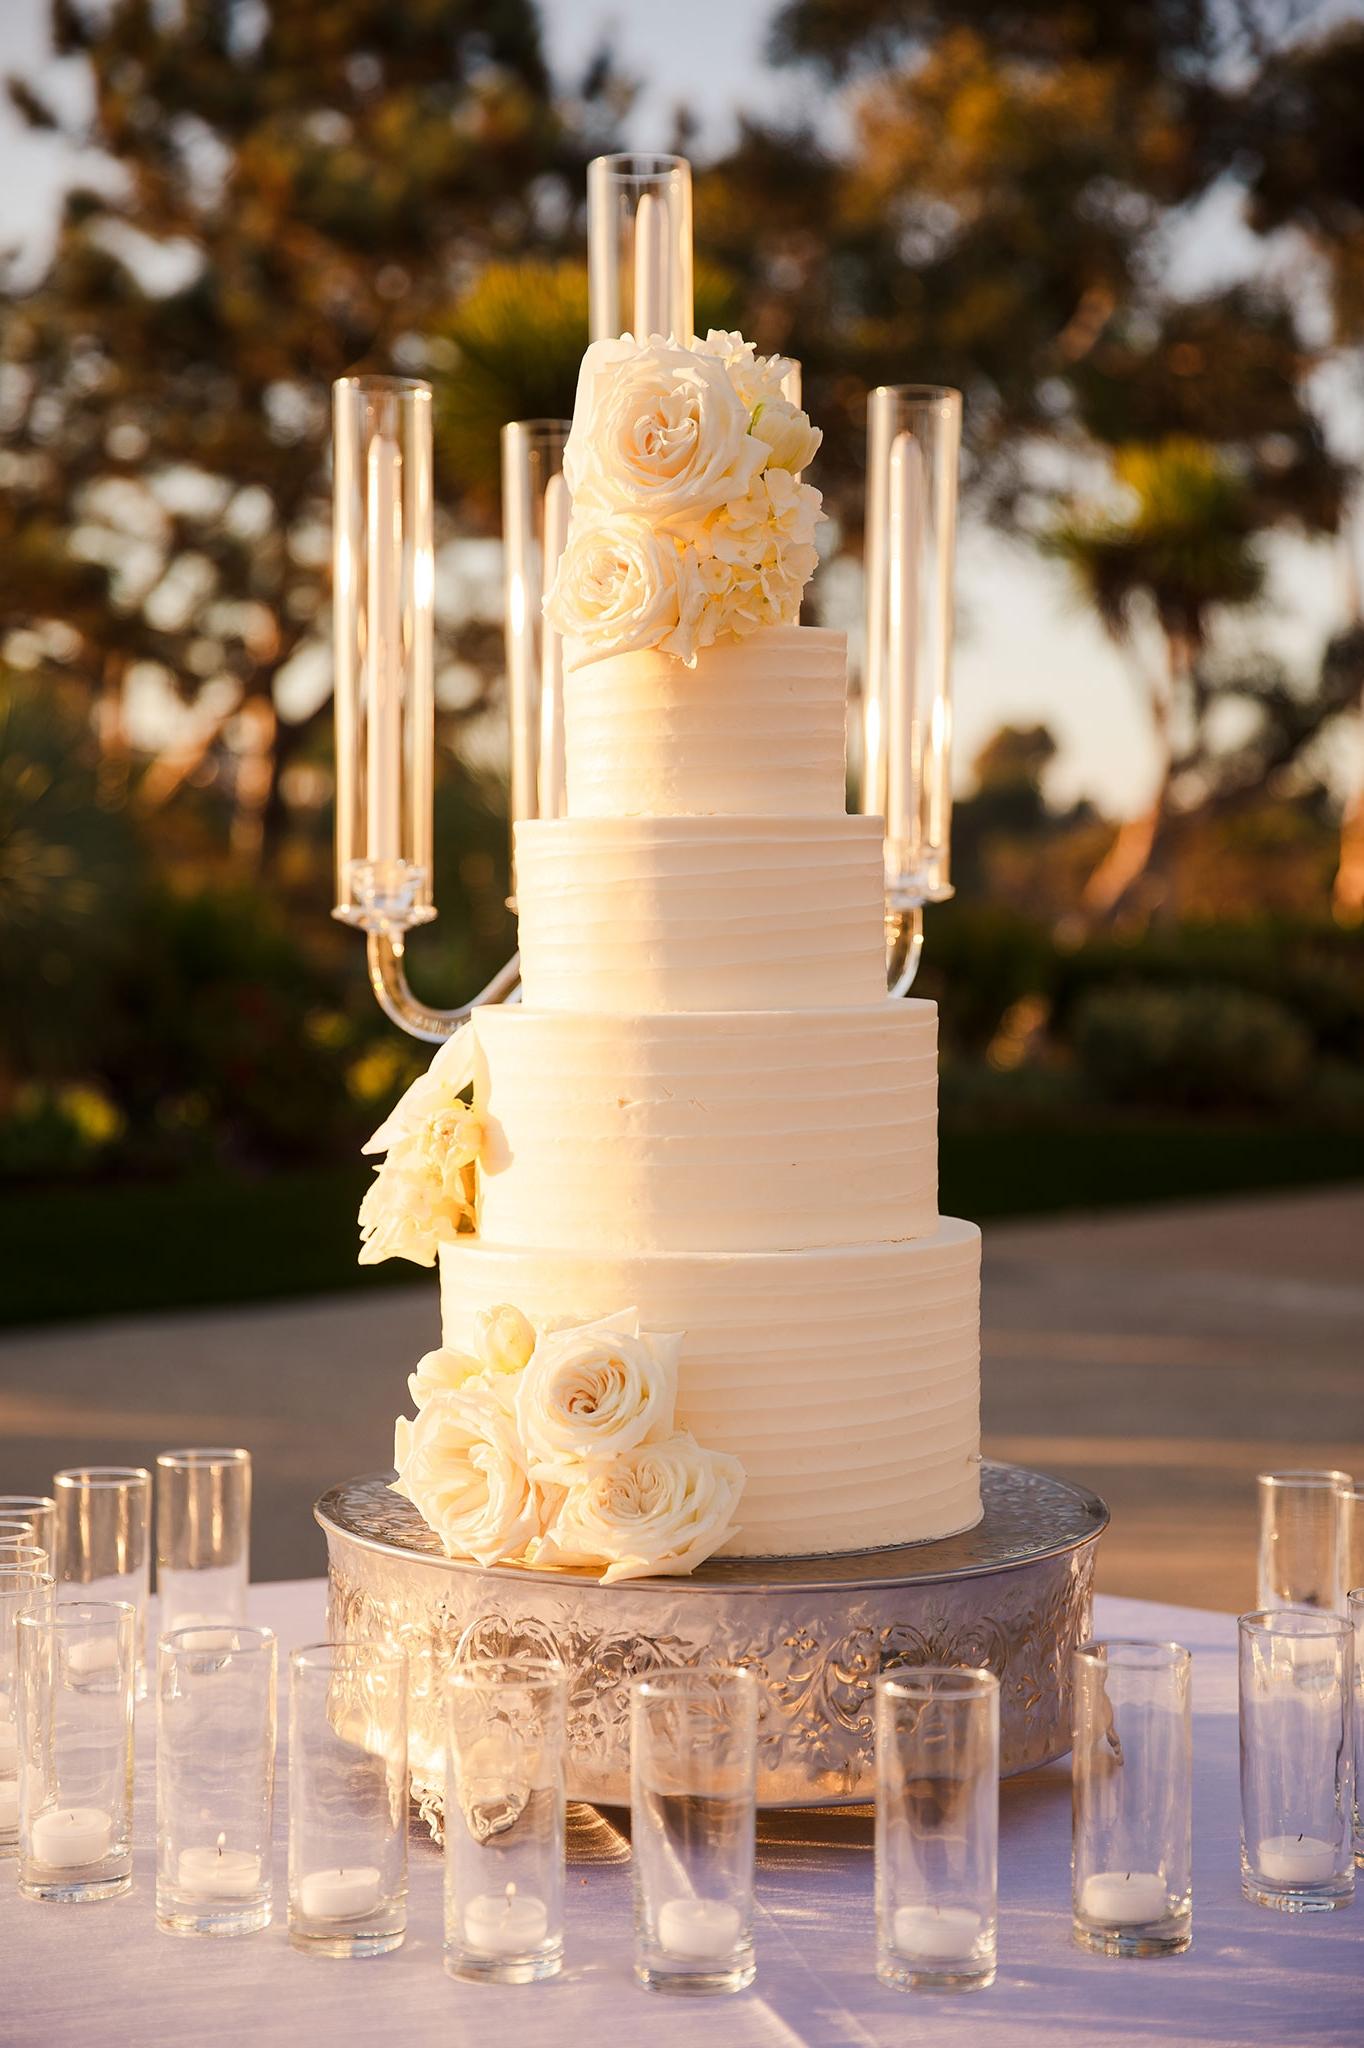 18-ritz-carlton-laguna-niguel-indian-wedding-photography-1.jpg